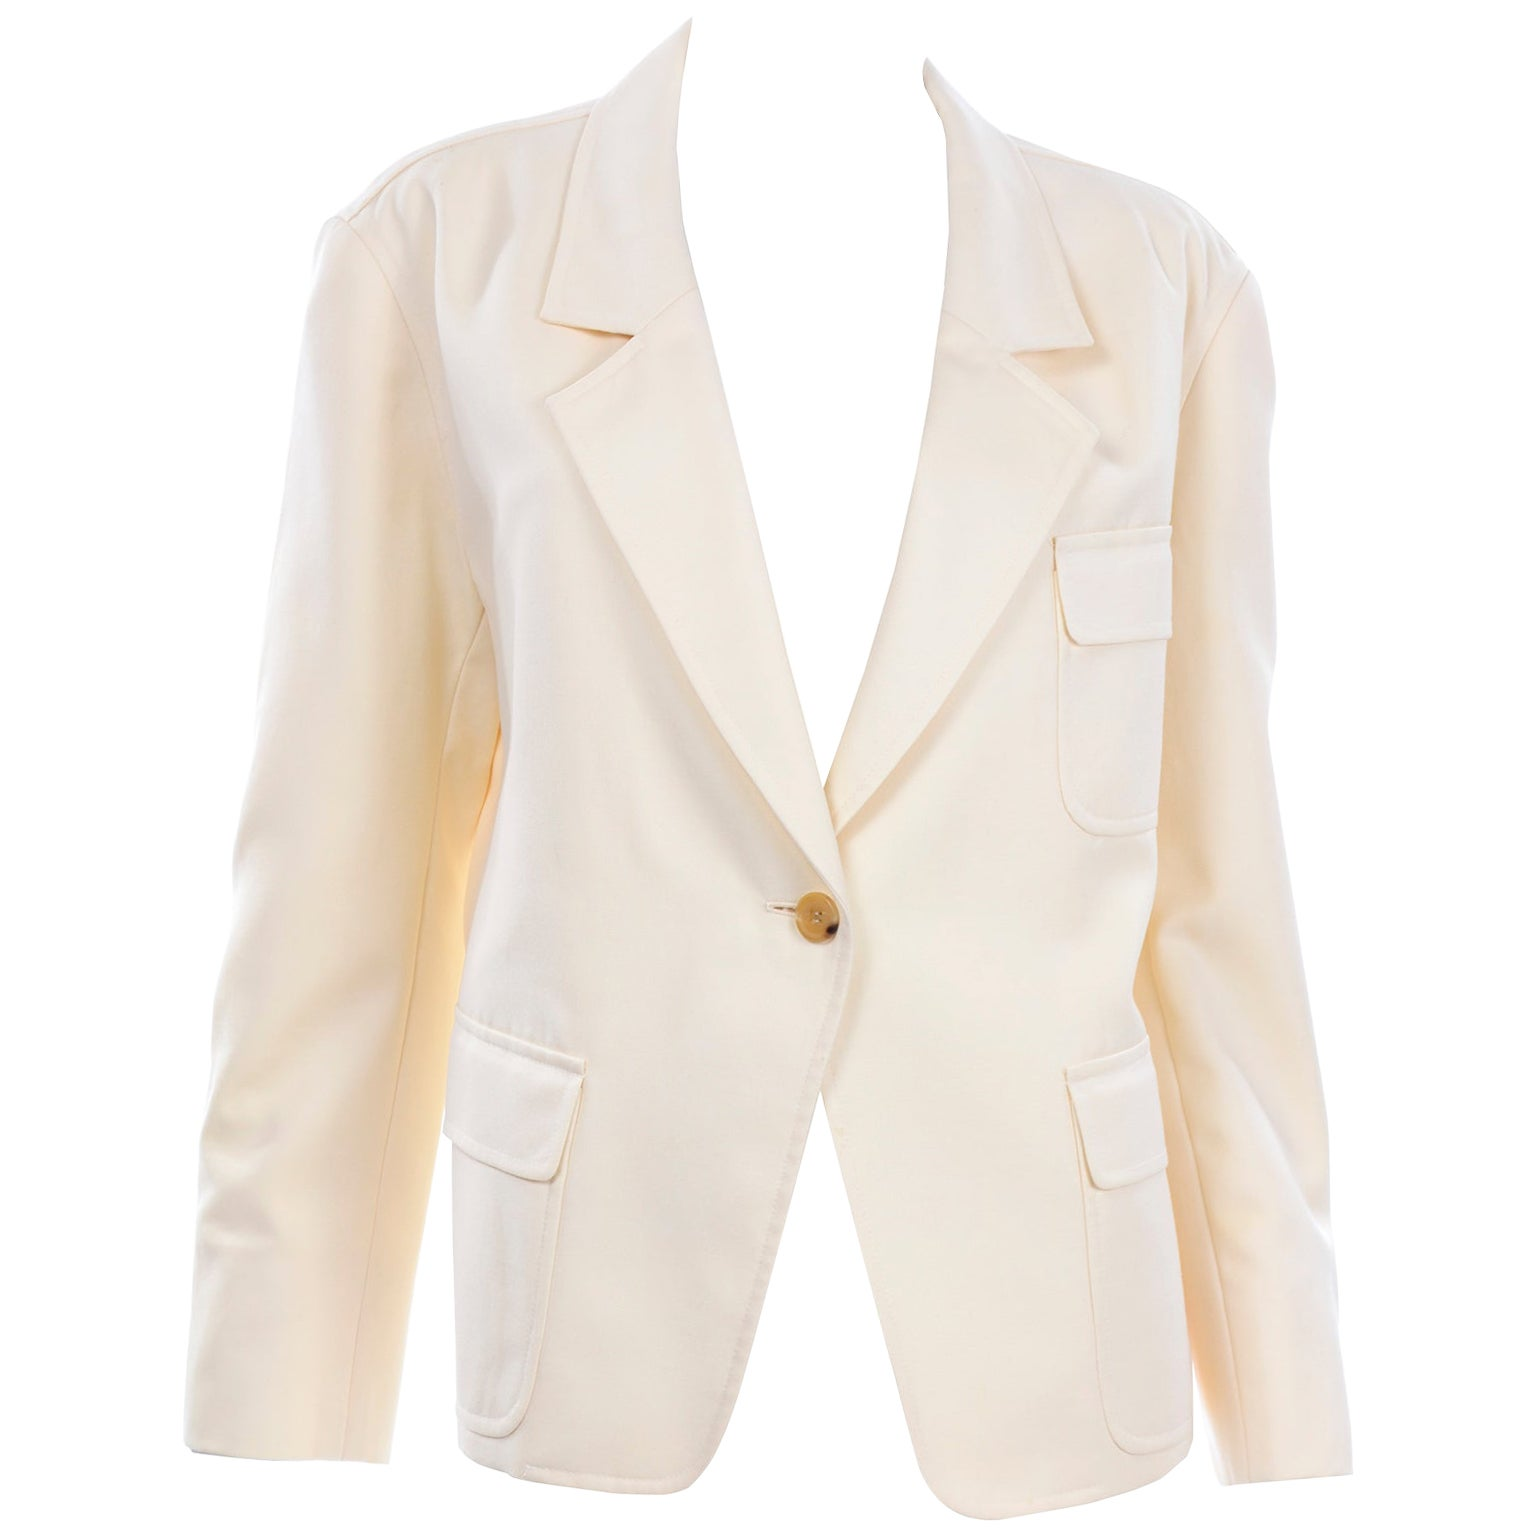 Isaac Mizrahi Vintage Cream Wool Boxy Blazer Jacket Size Large